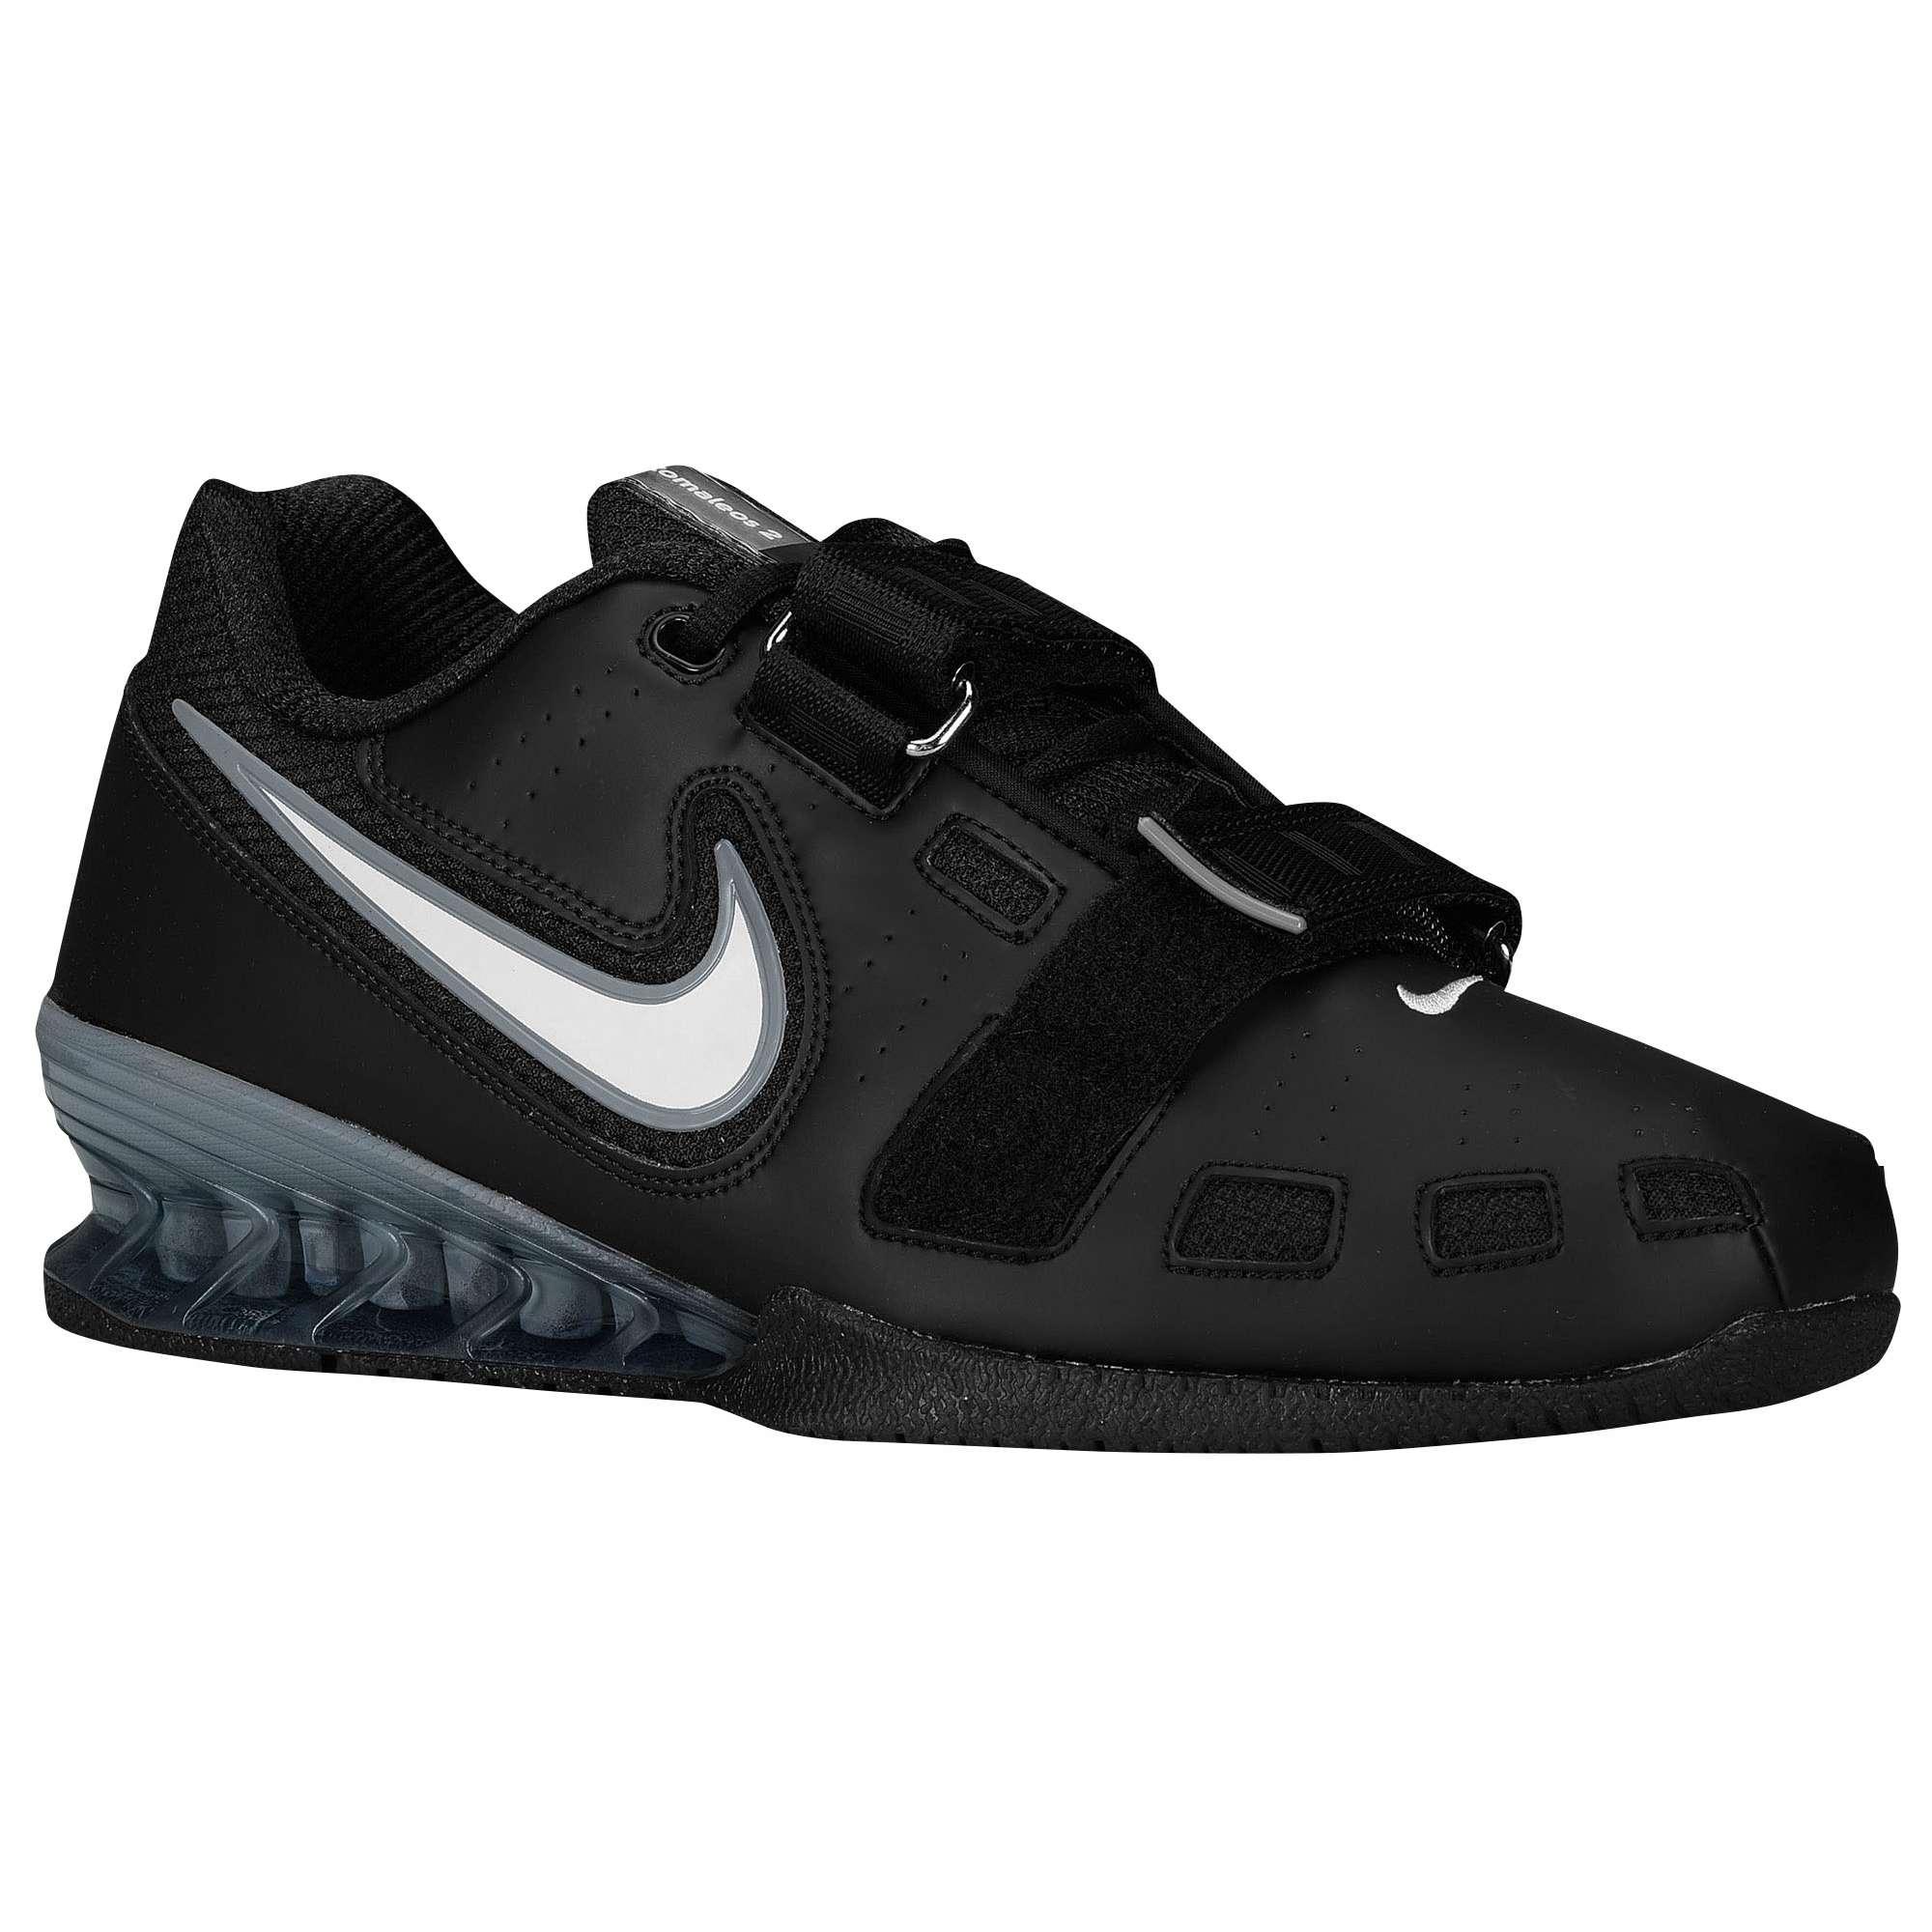 Nike Romaleos 2 (Zwart) - Zijaanzicht ...